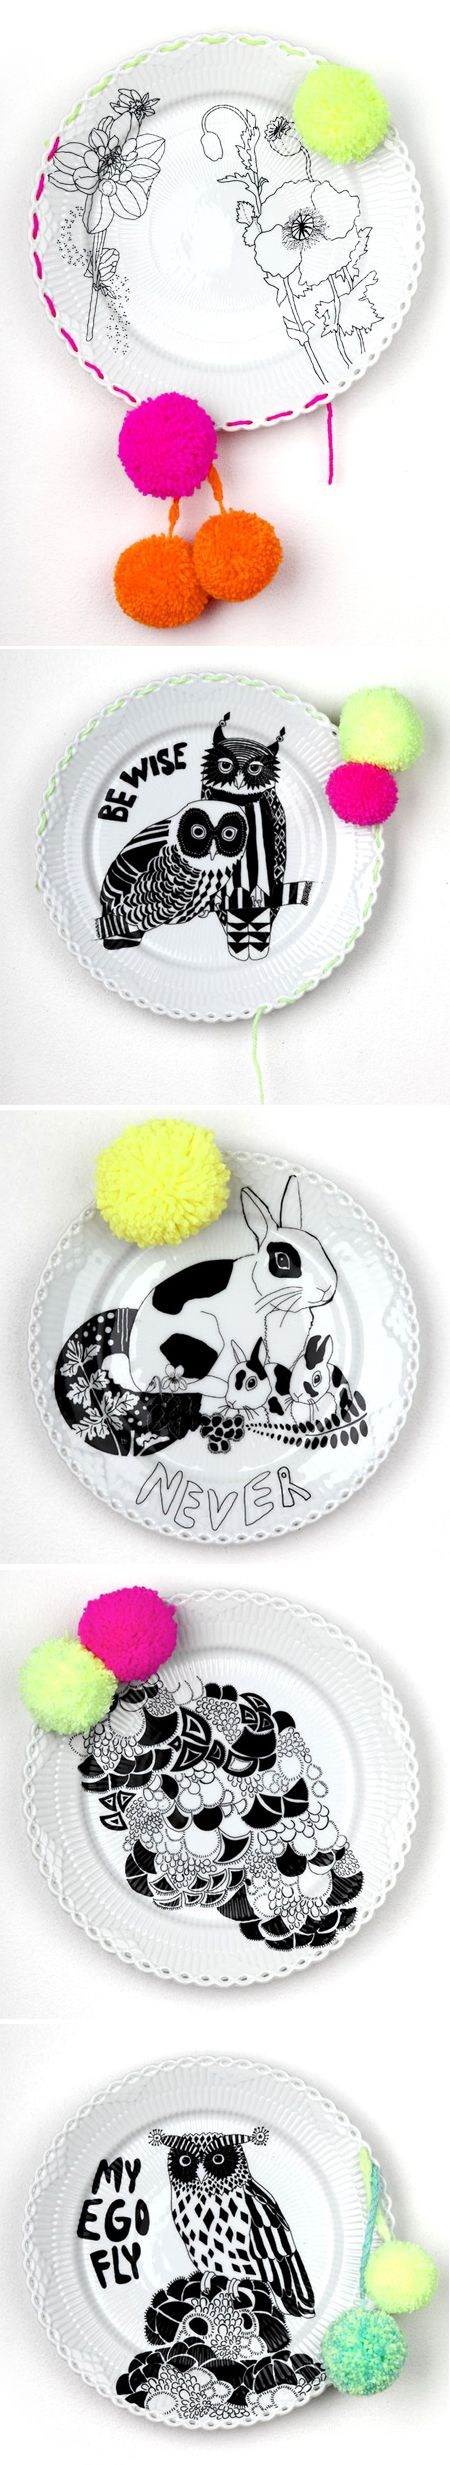 :]Diy Crafts, Lisa Grue Jpg 450 2465, Plates Lisa, Grue Plates, Crafty Ideas